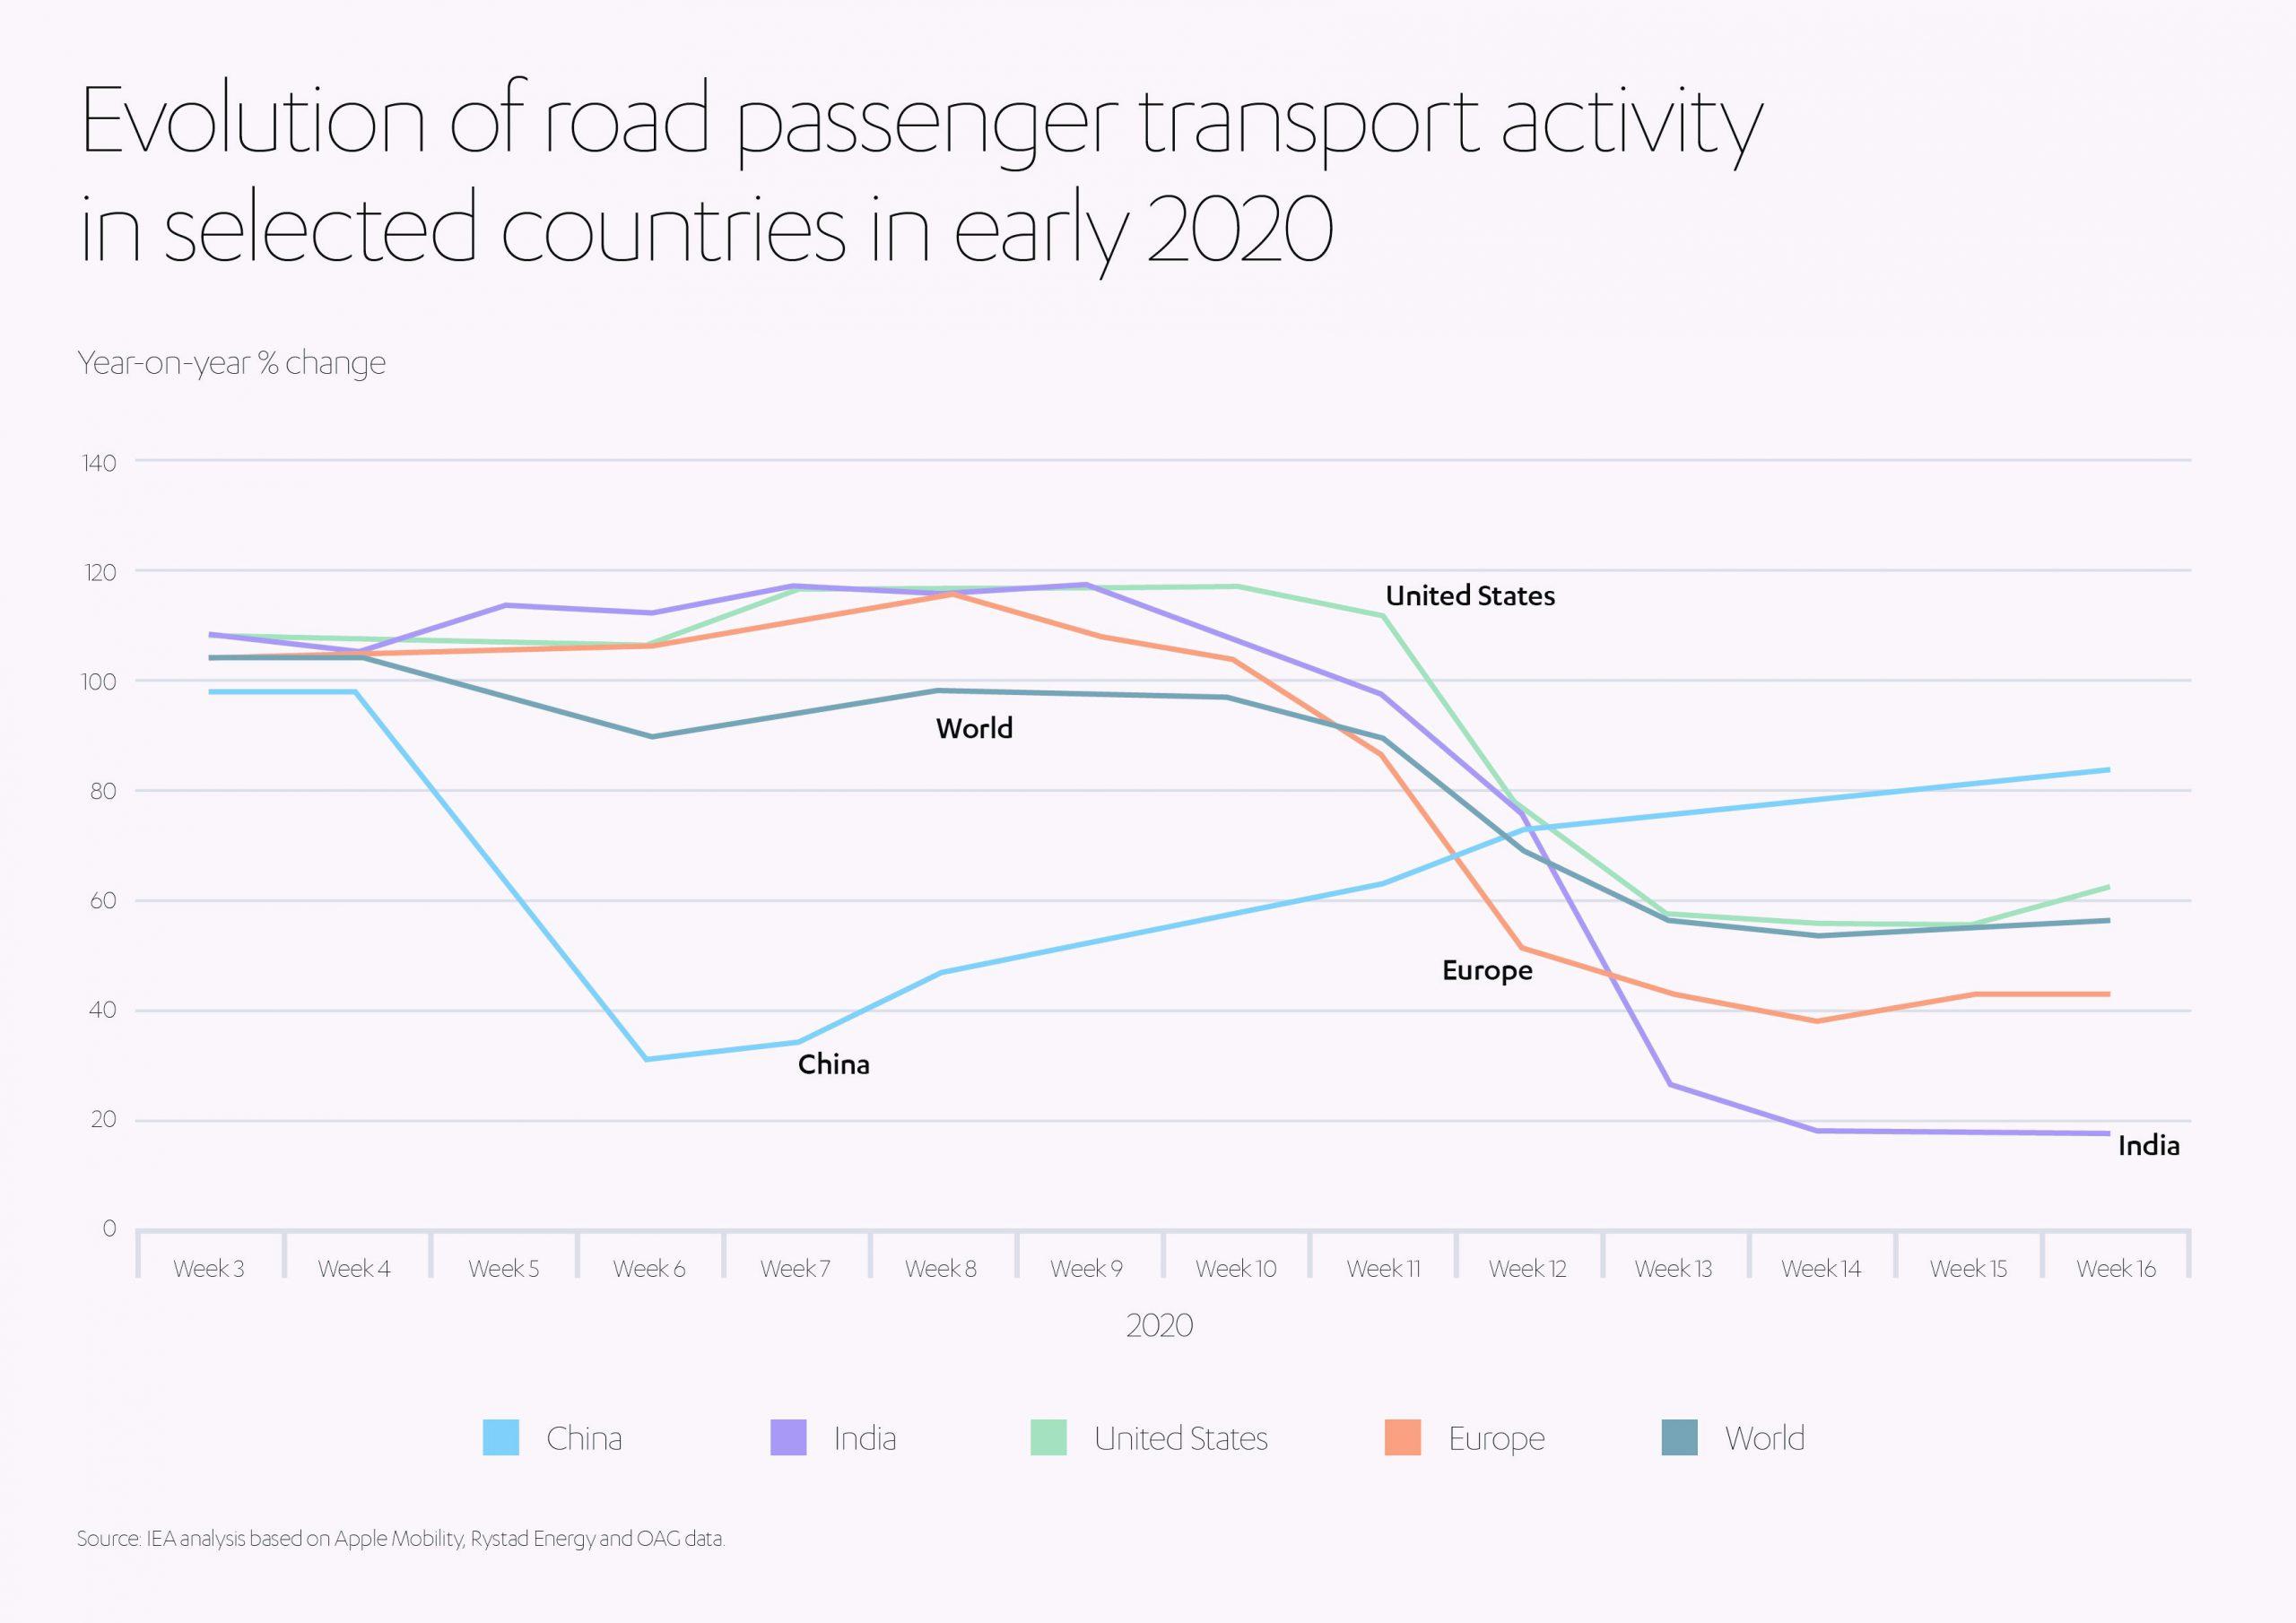 Evolution of Road Passenger Transport Activity